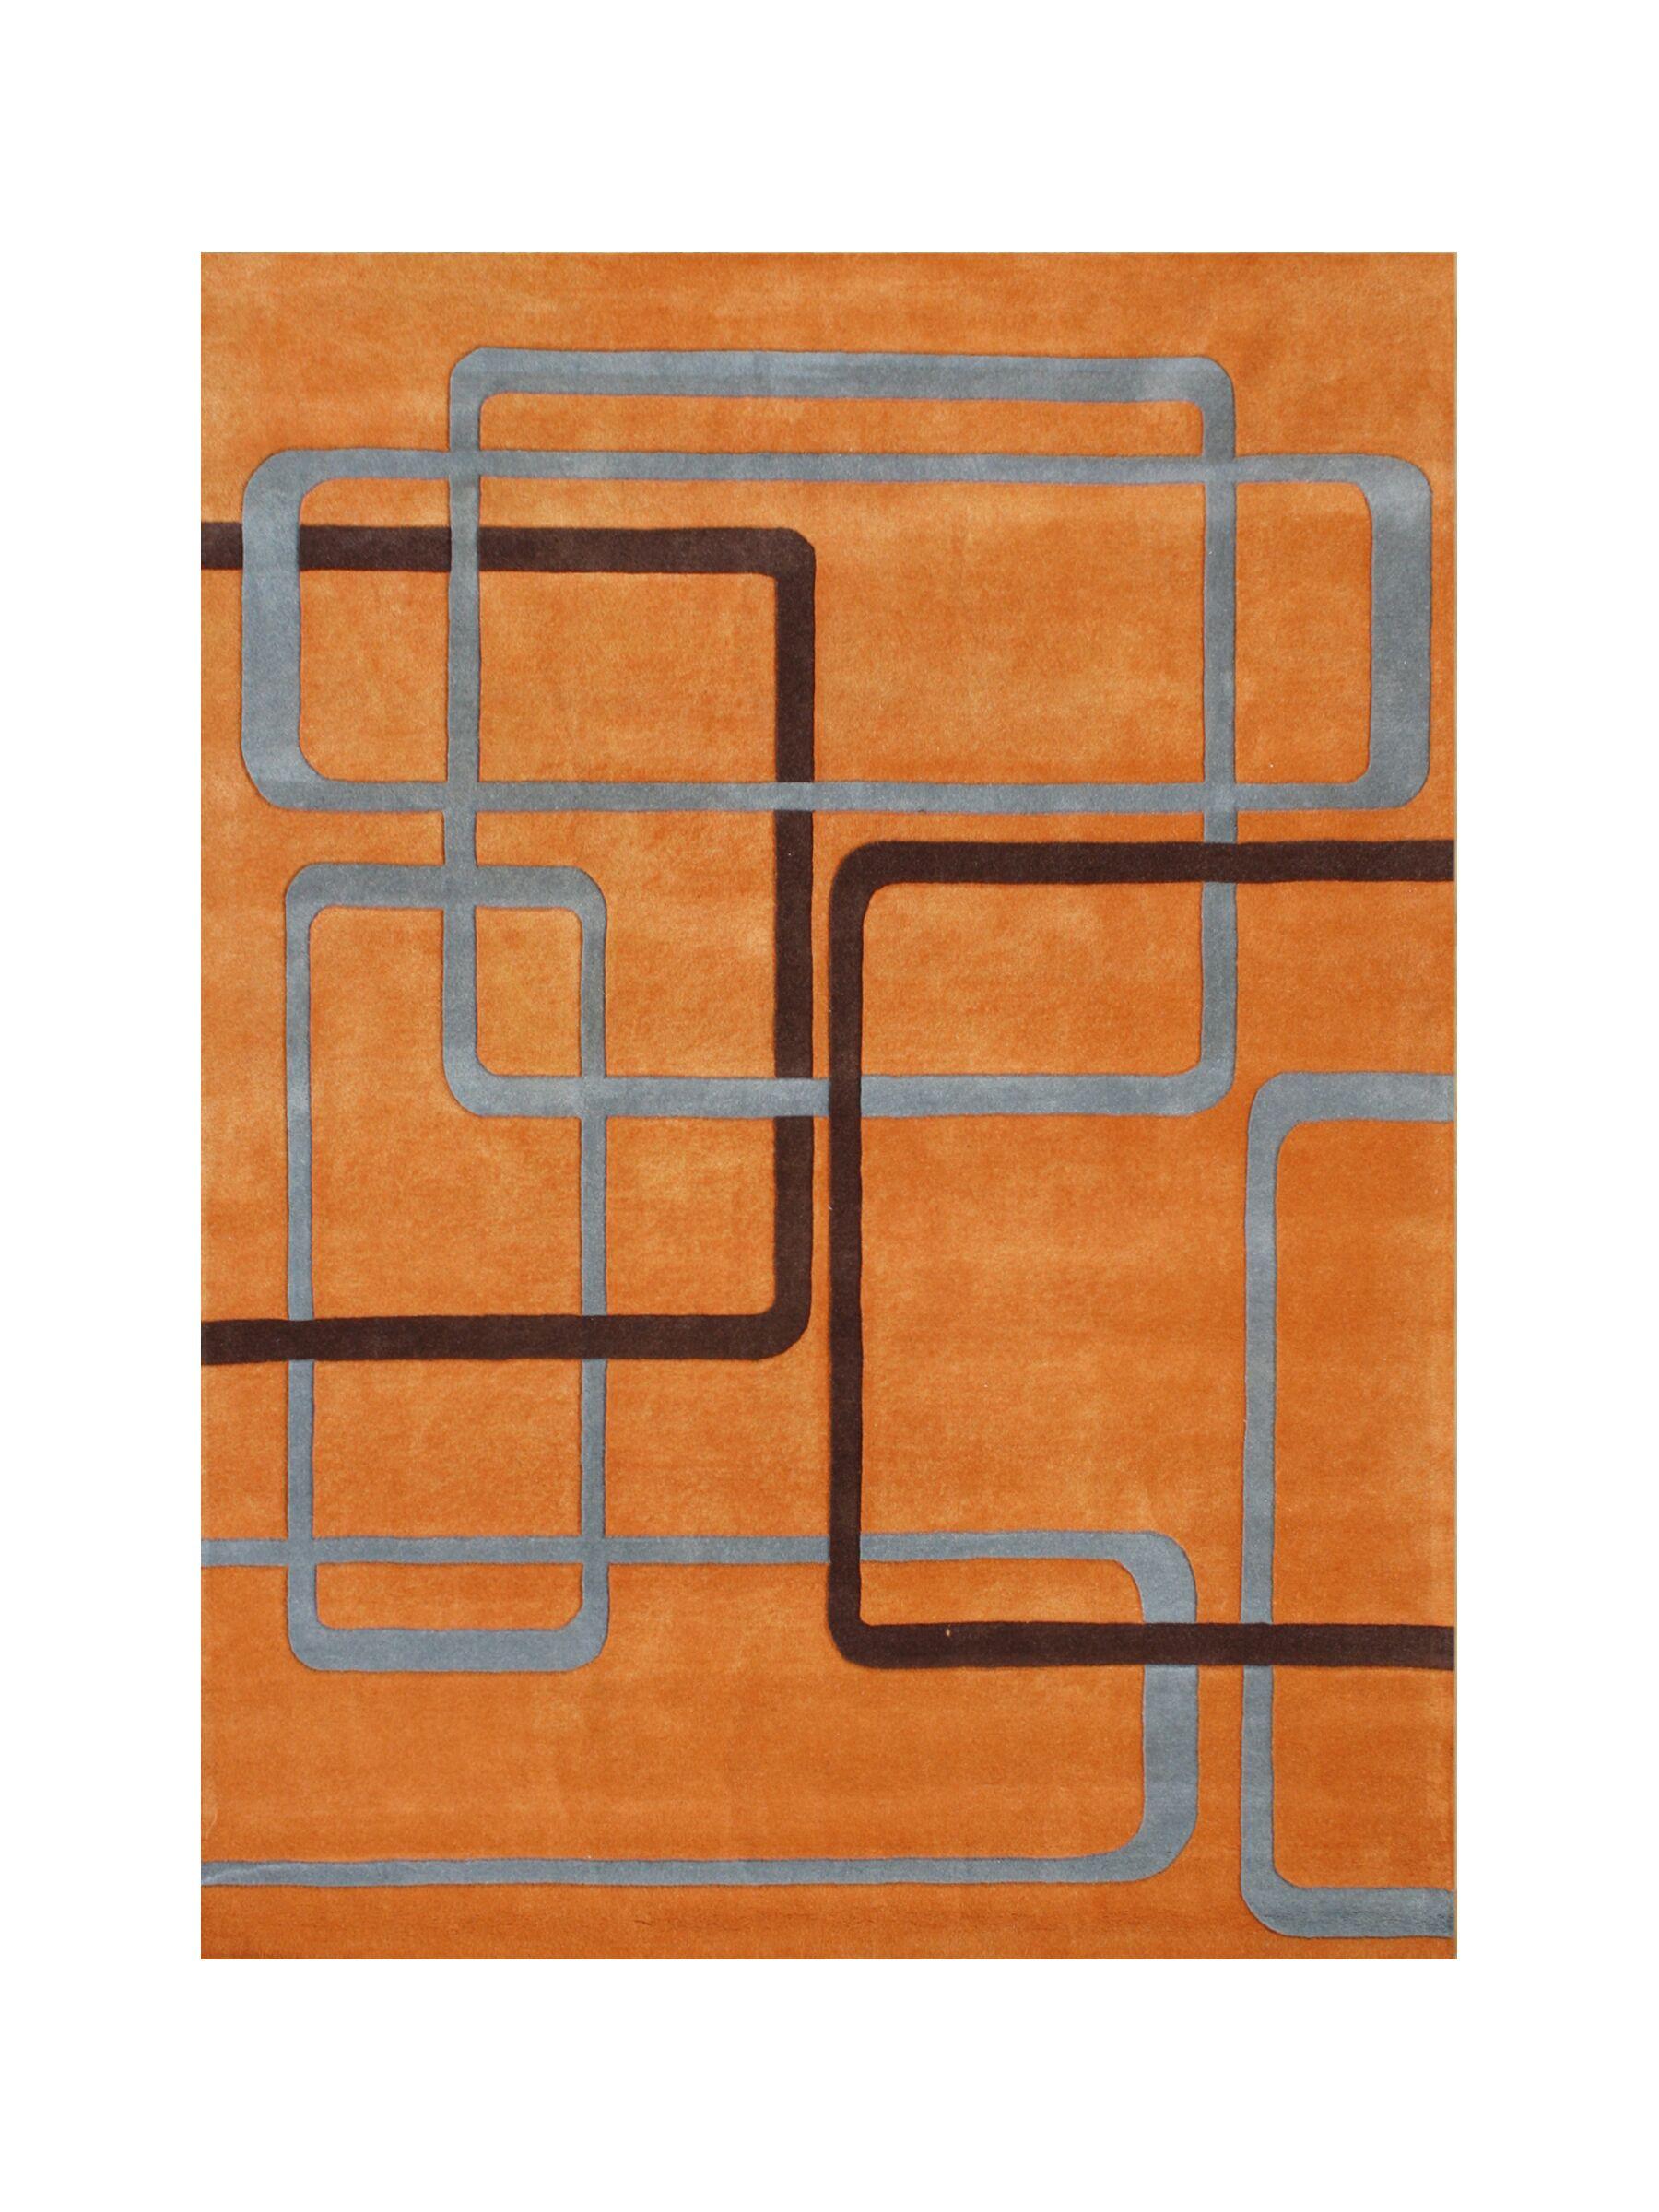 Akot Hand-Tufted Orange Area Rug Rug Size: 5' x 8'